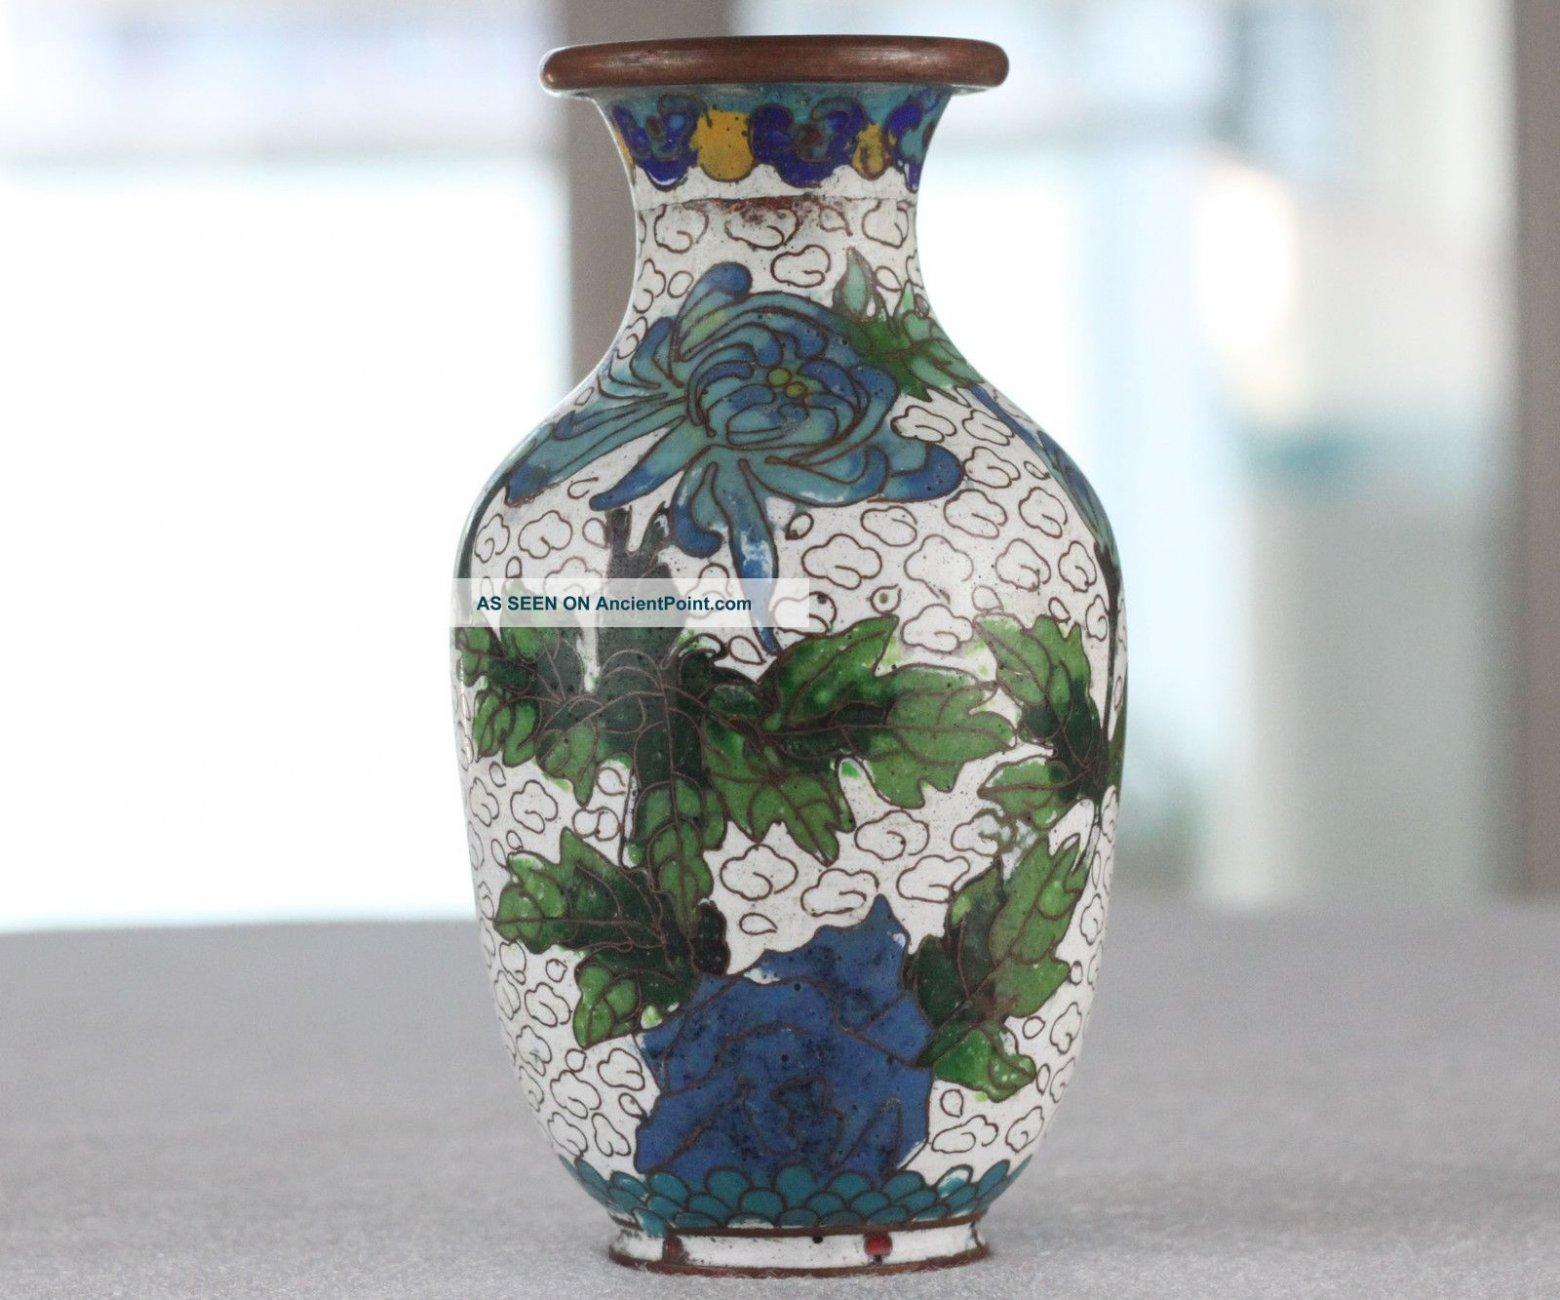 chinese_flowers_old_cloisonne_handmade_vase_1_lgw.jpg